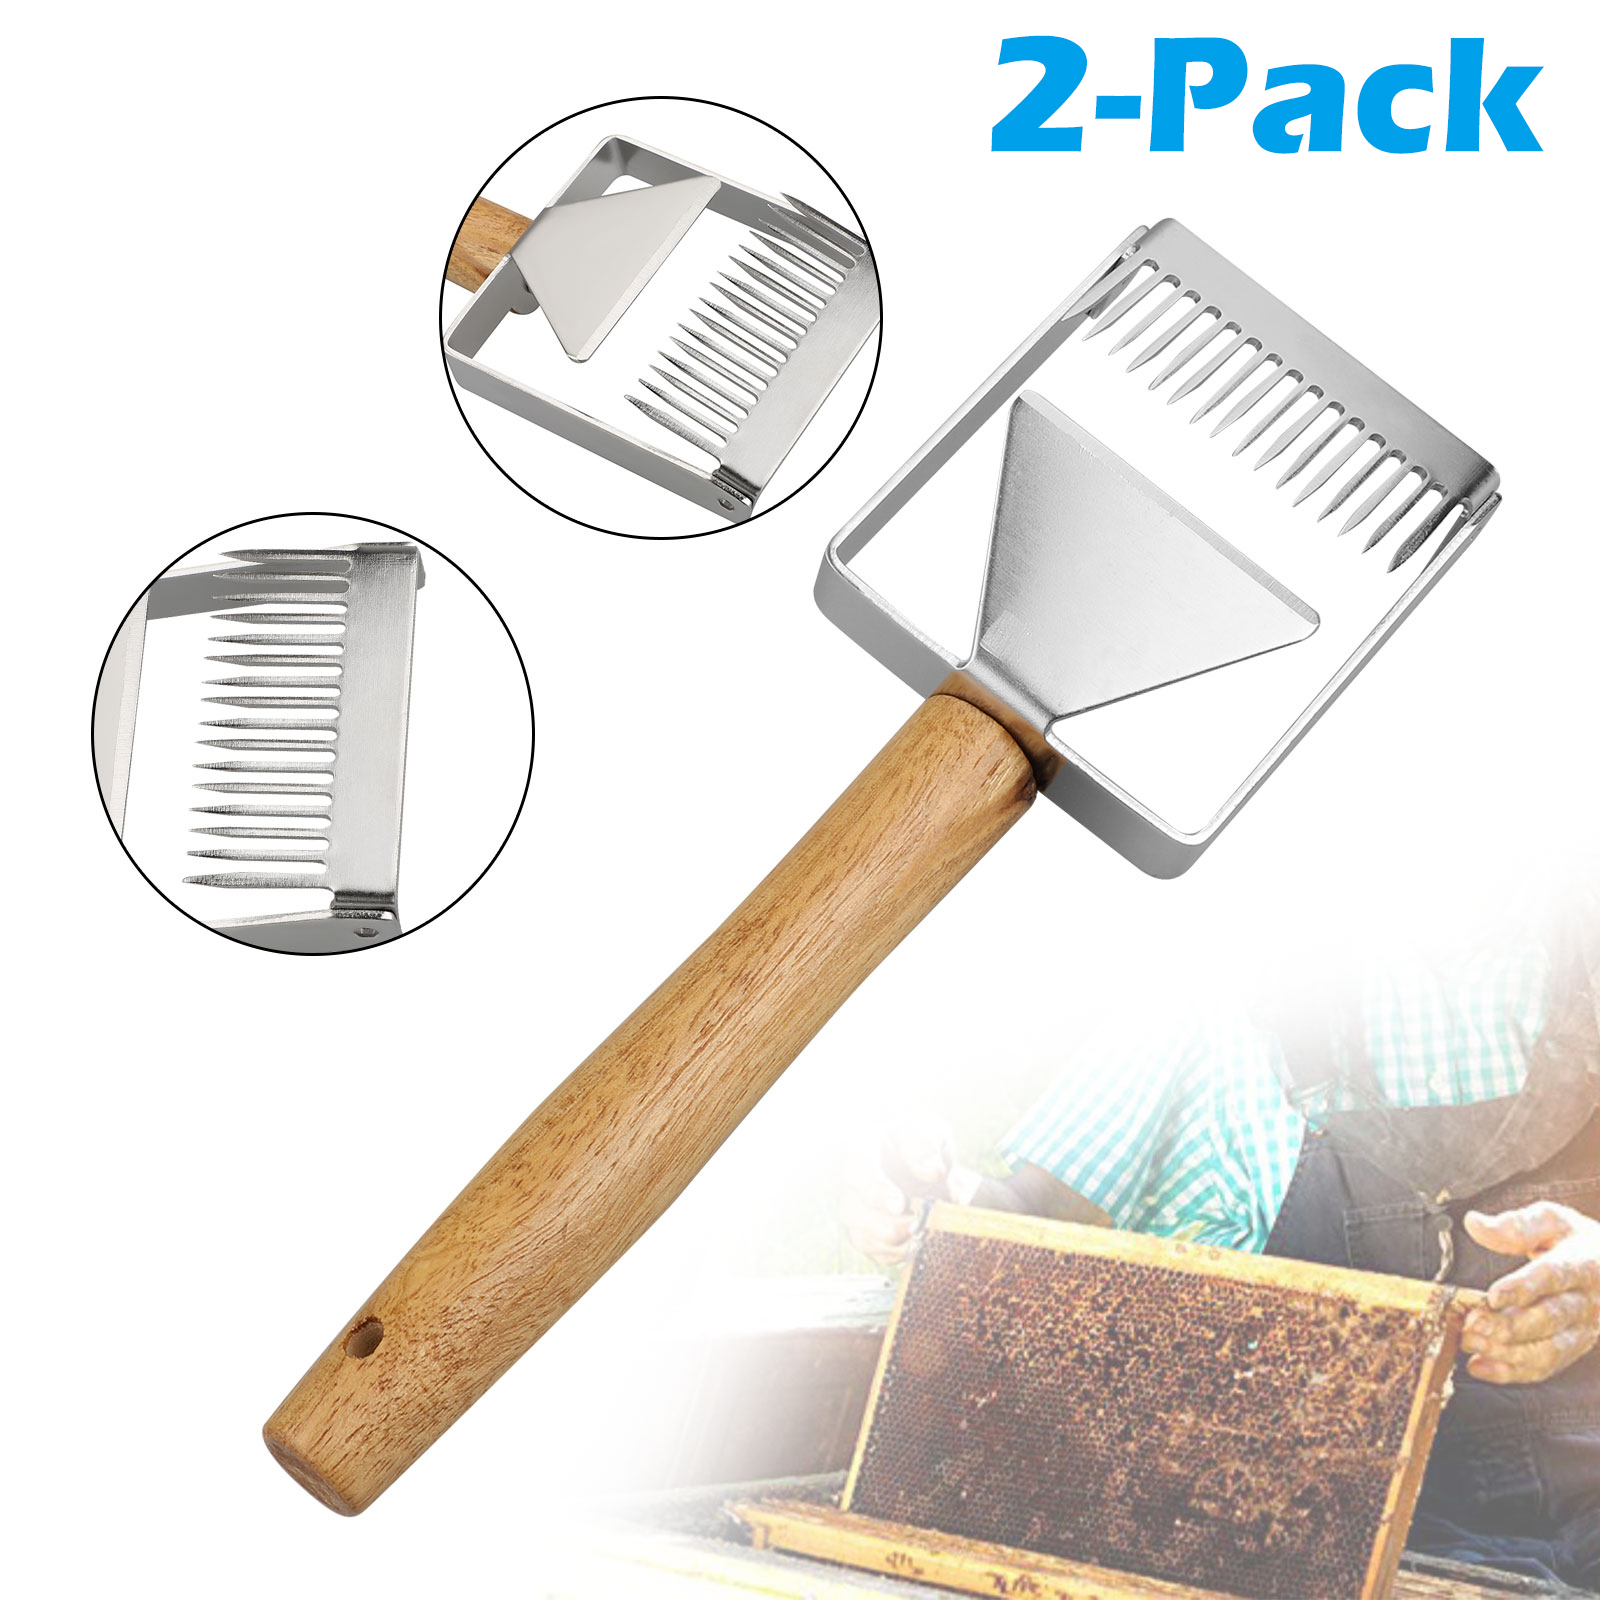 Garden supplies Stainless Steel  Uncapping fork Beekeeping Tool Honey Scraper